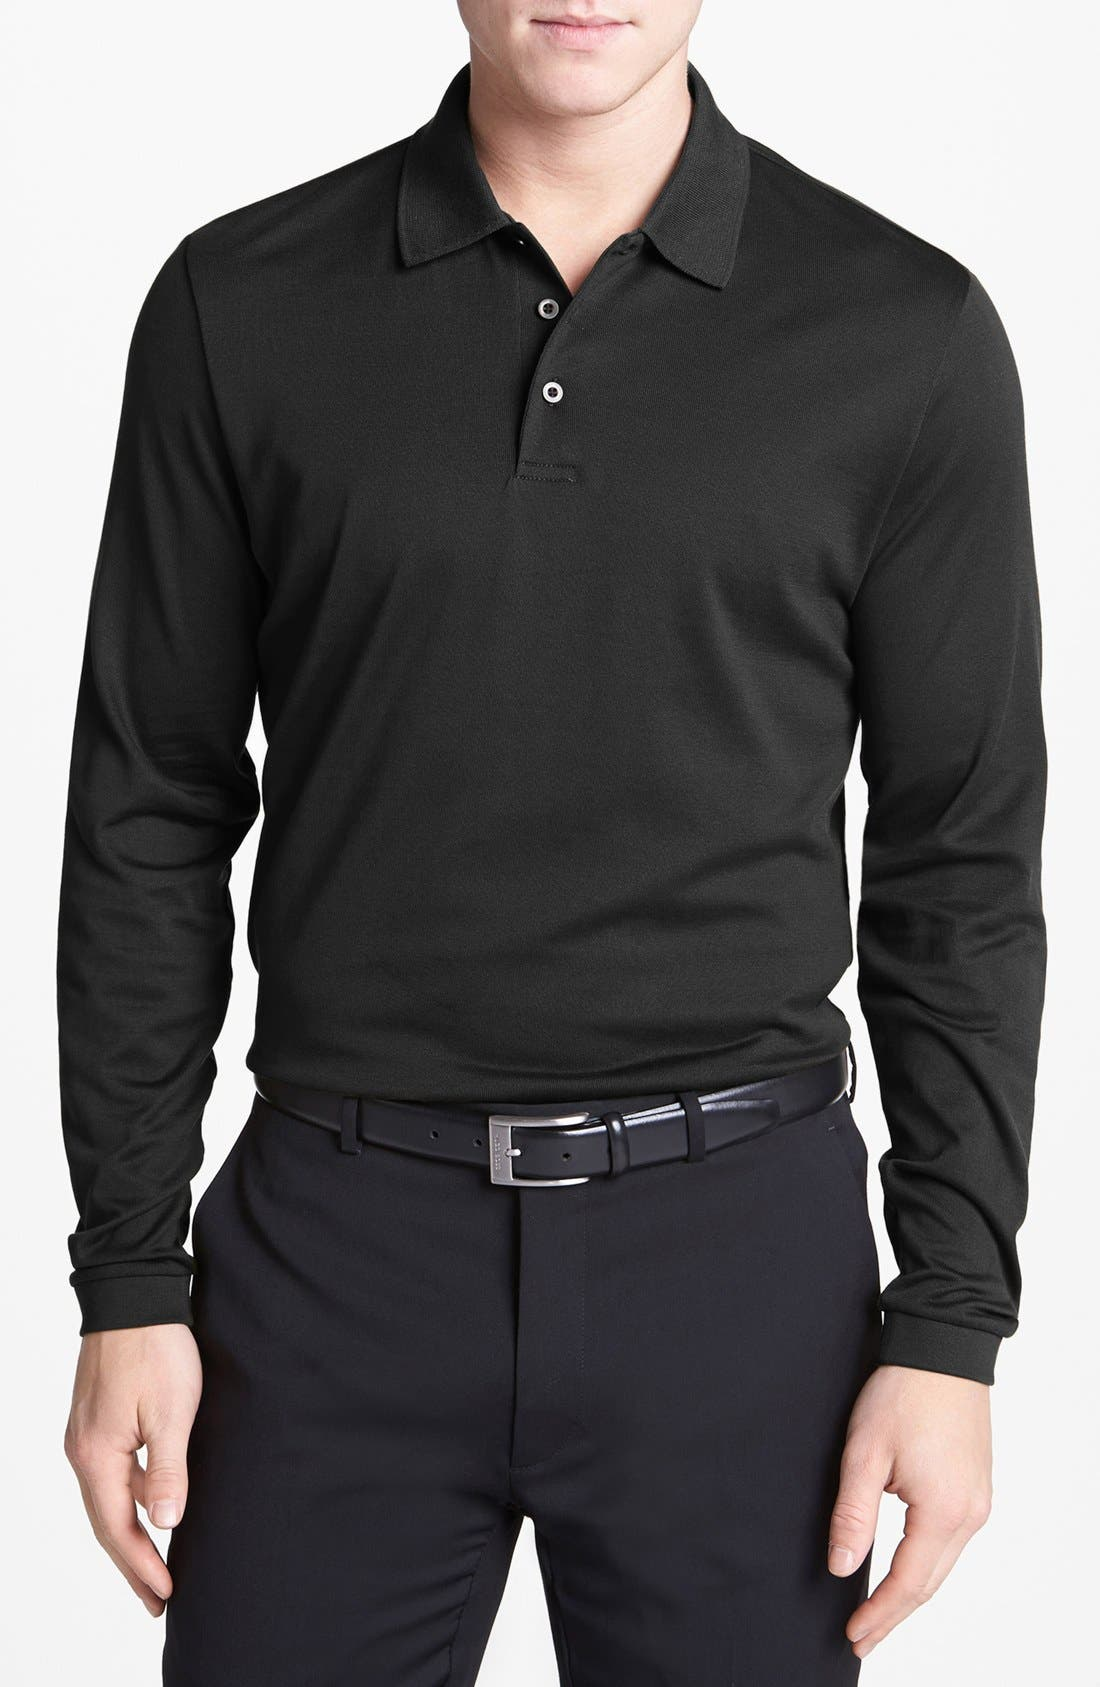 Alternate Image 1 Selected - Robert Barakett 'Palermo' Long Sleeve Jersey Polo